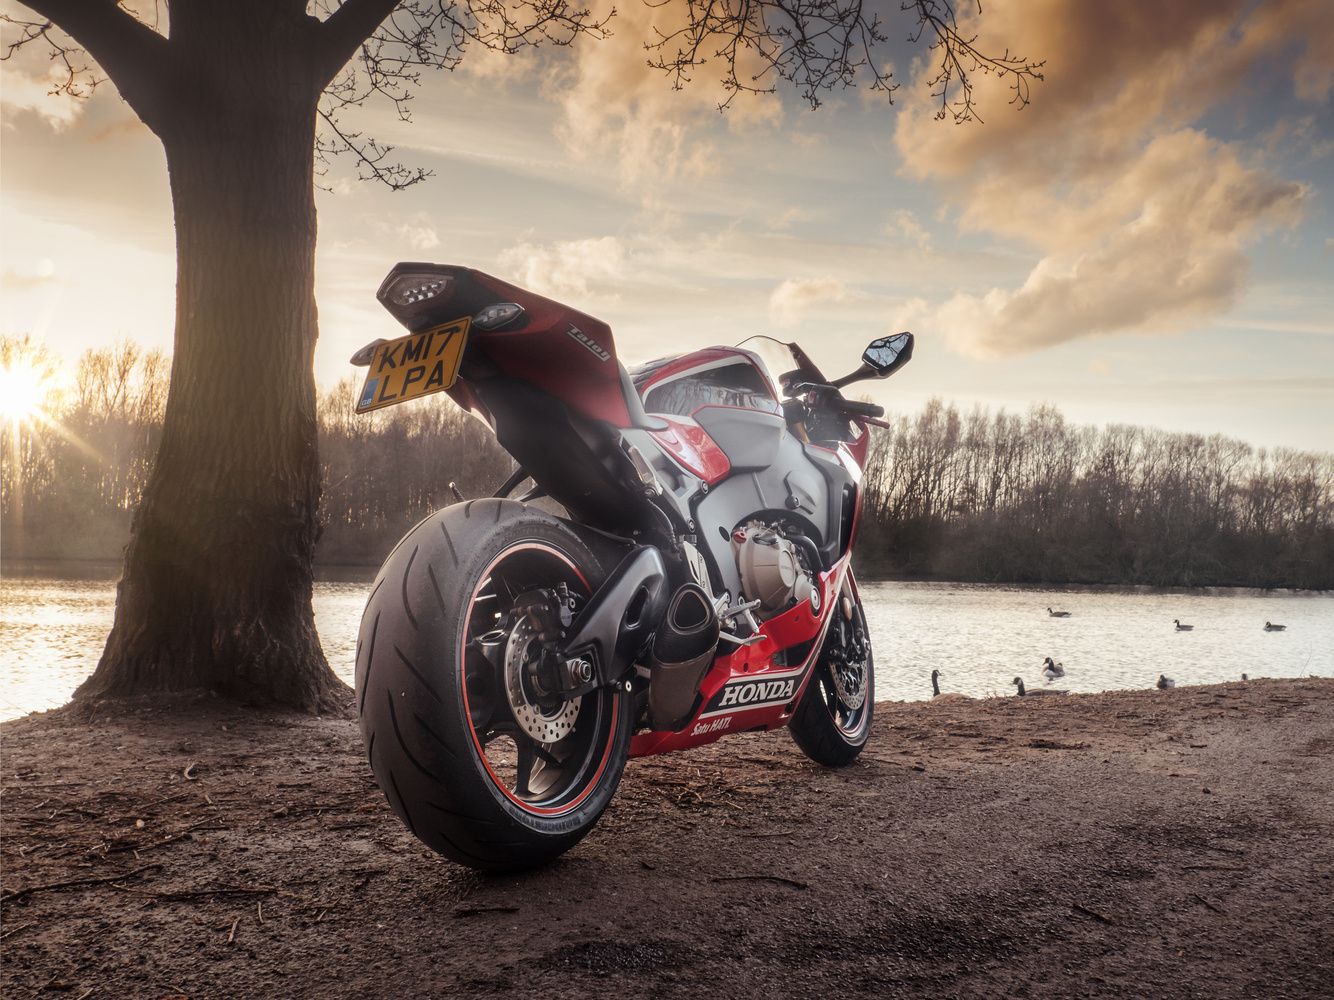 Sunset ride out by Dominik Krzyszczak